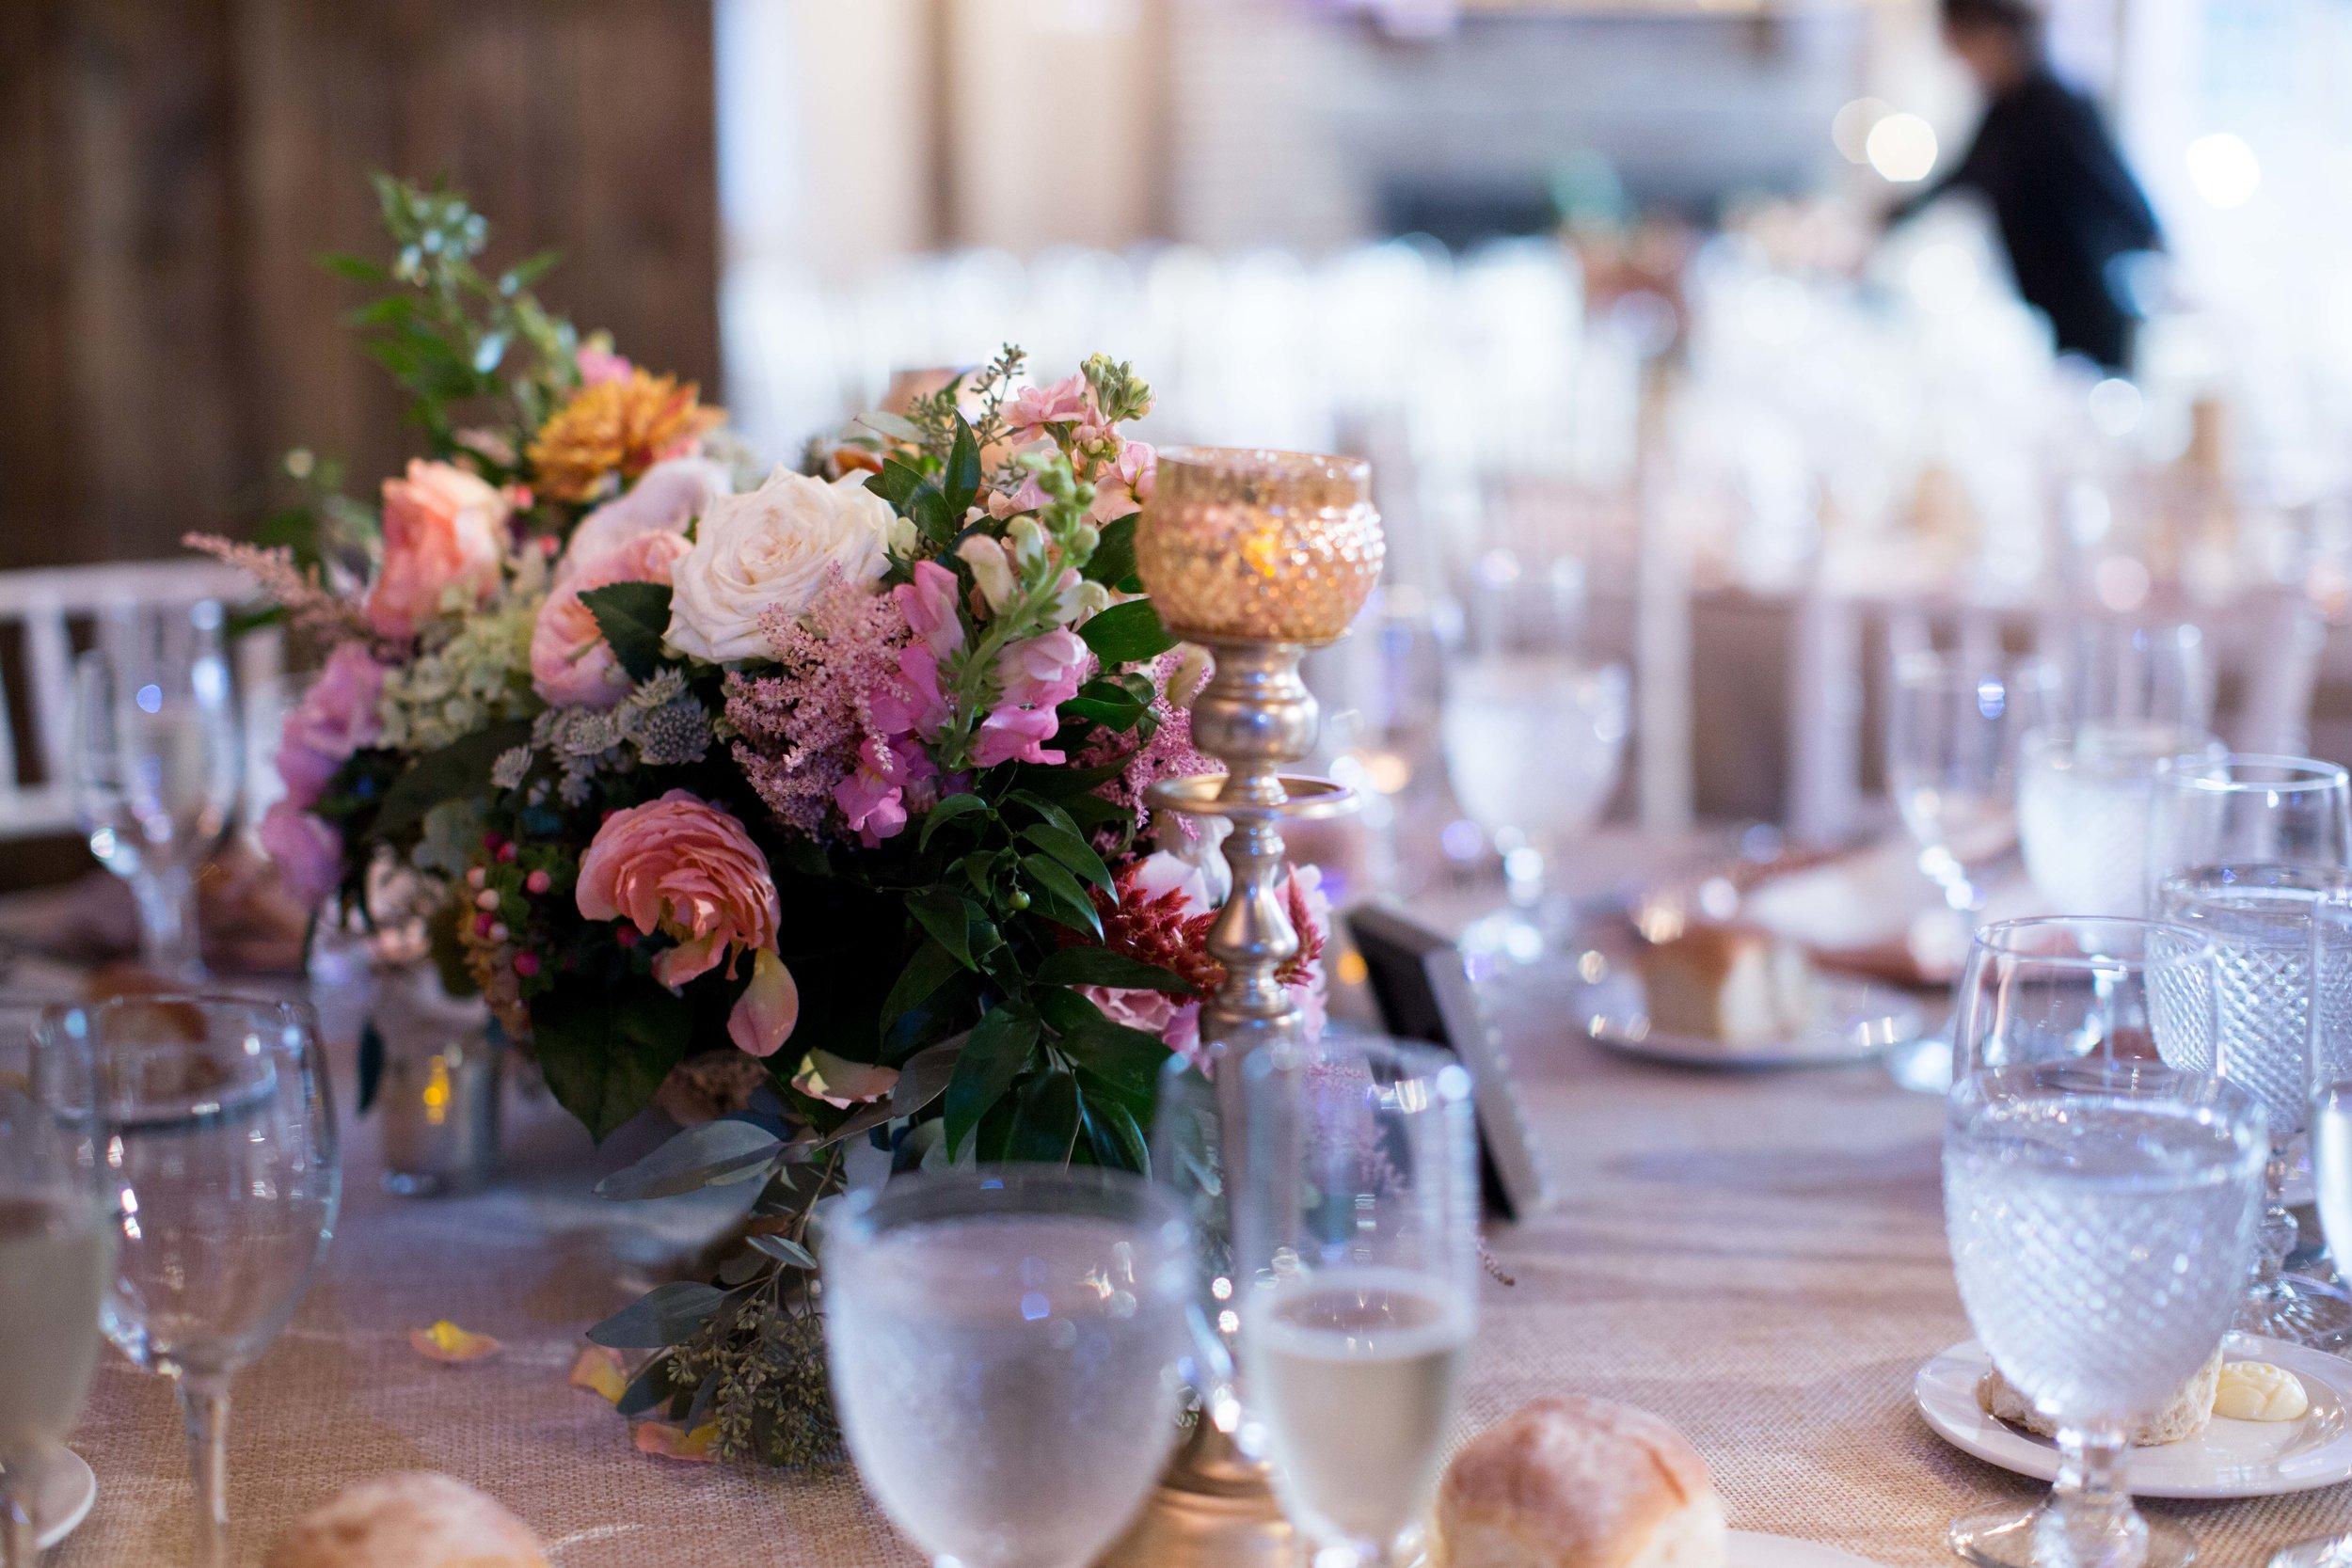 Philadelphia-Wedding-Planner-Heart-And-Dash-NicoleConnor-DrewNoelPhotography-3040.jpg